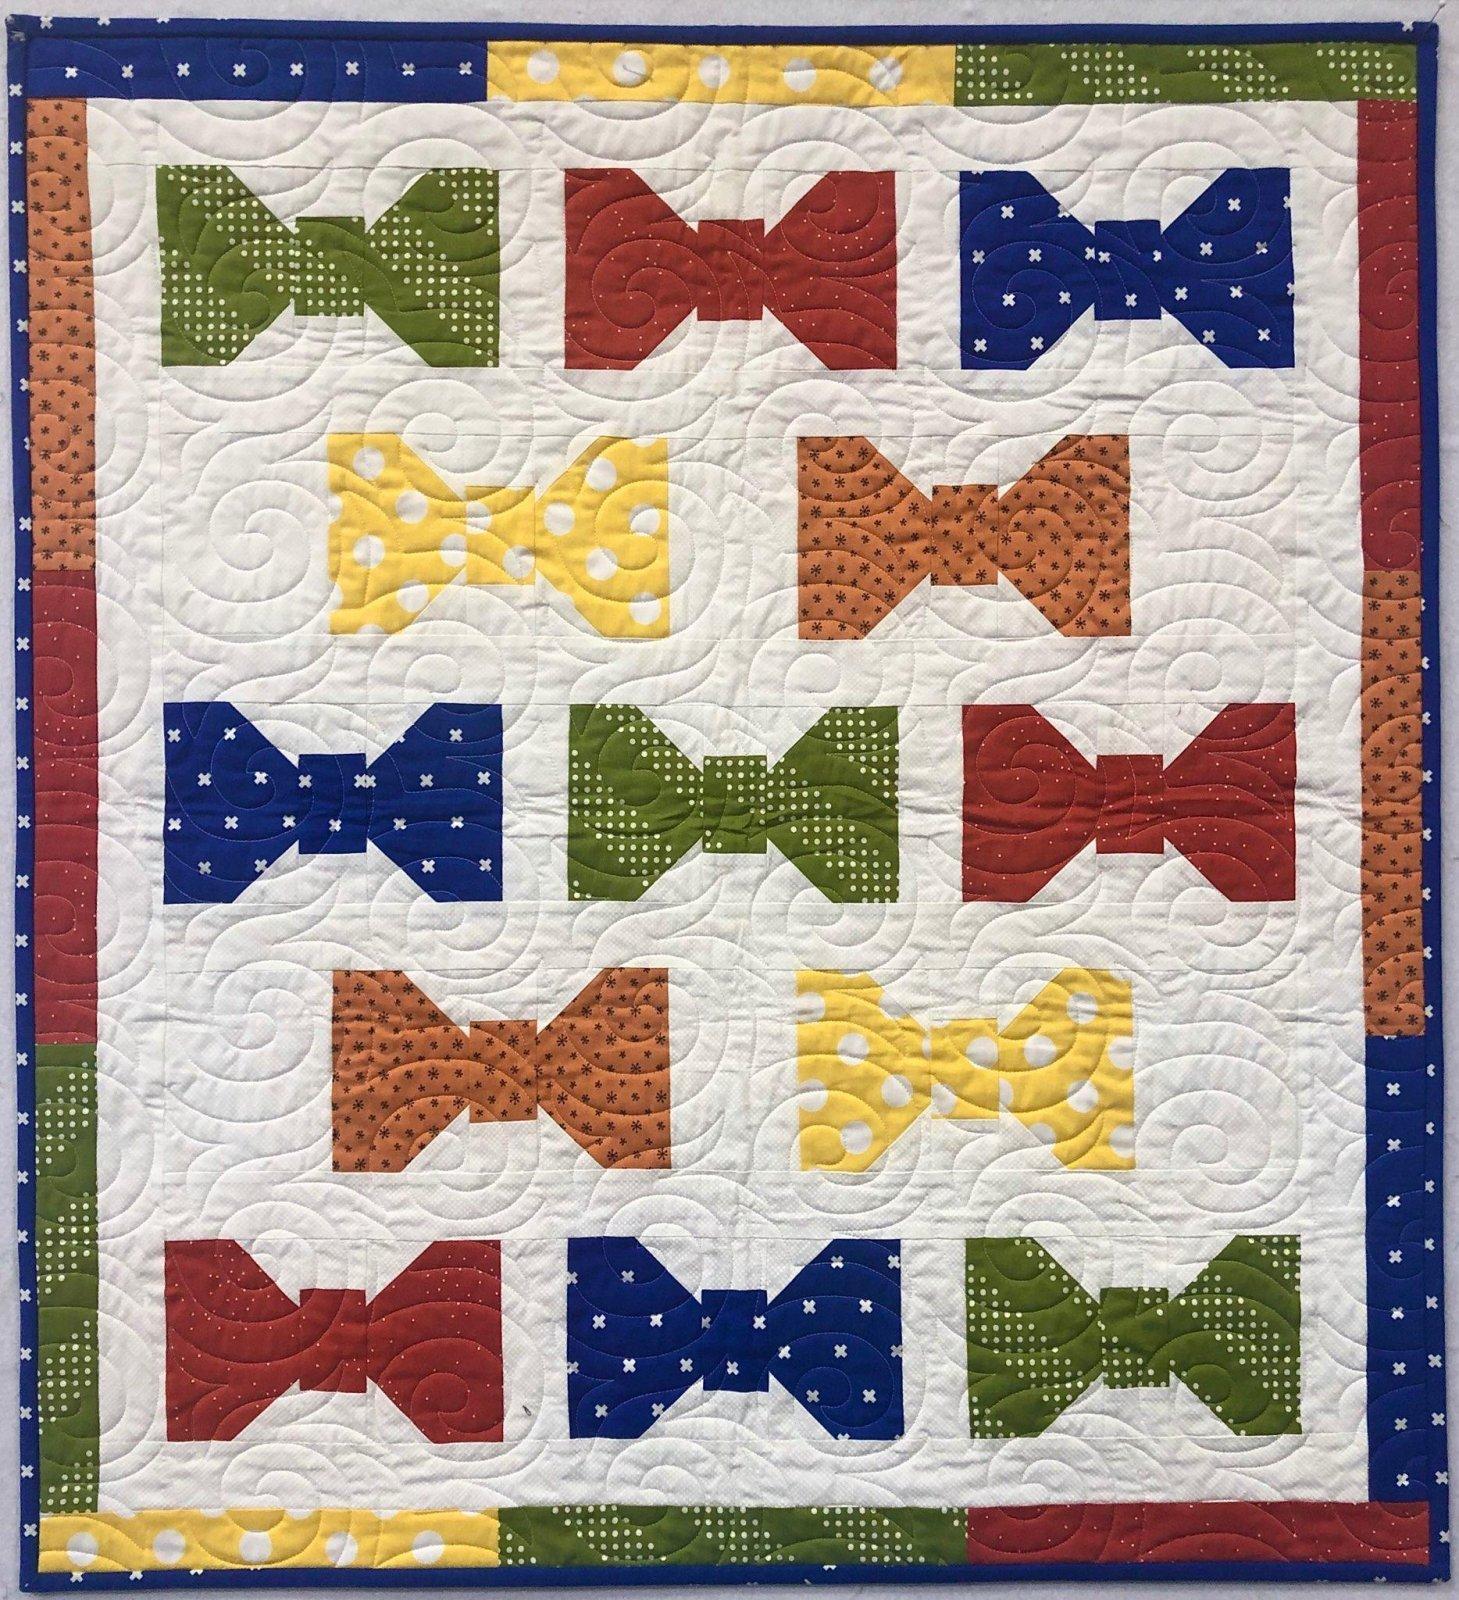 Bowtie Baby Quilt Kit